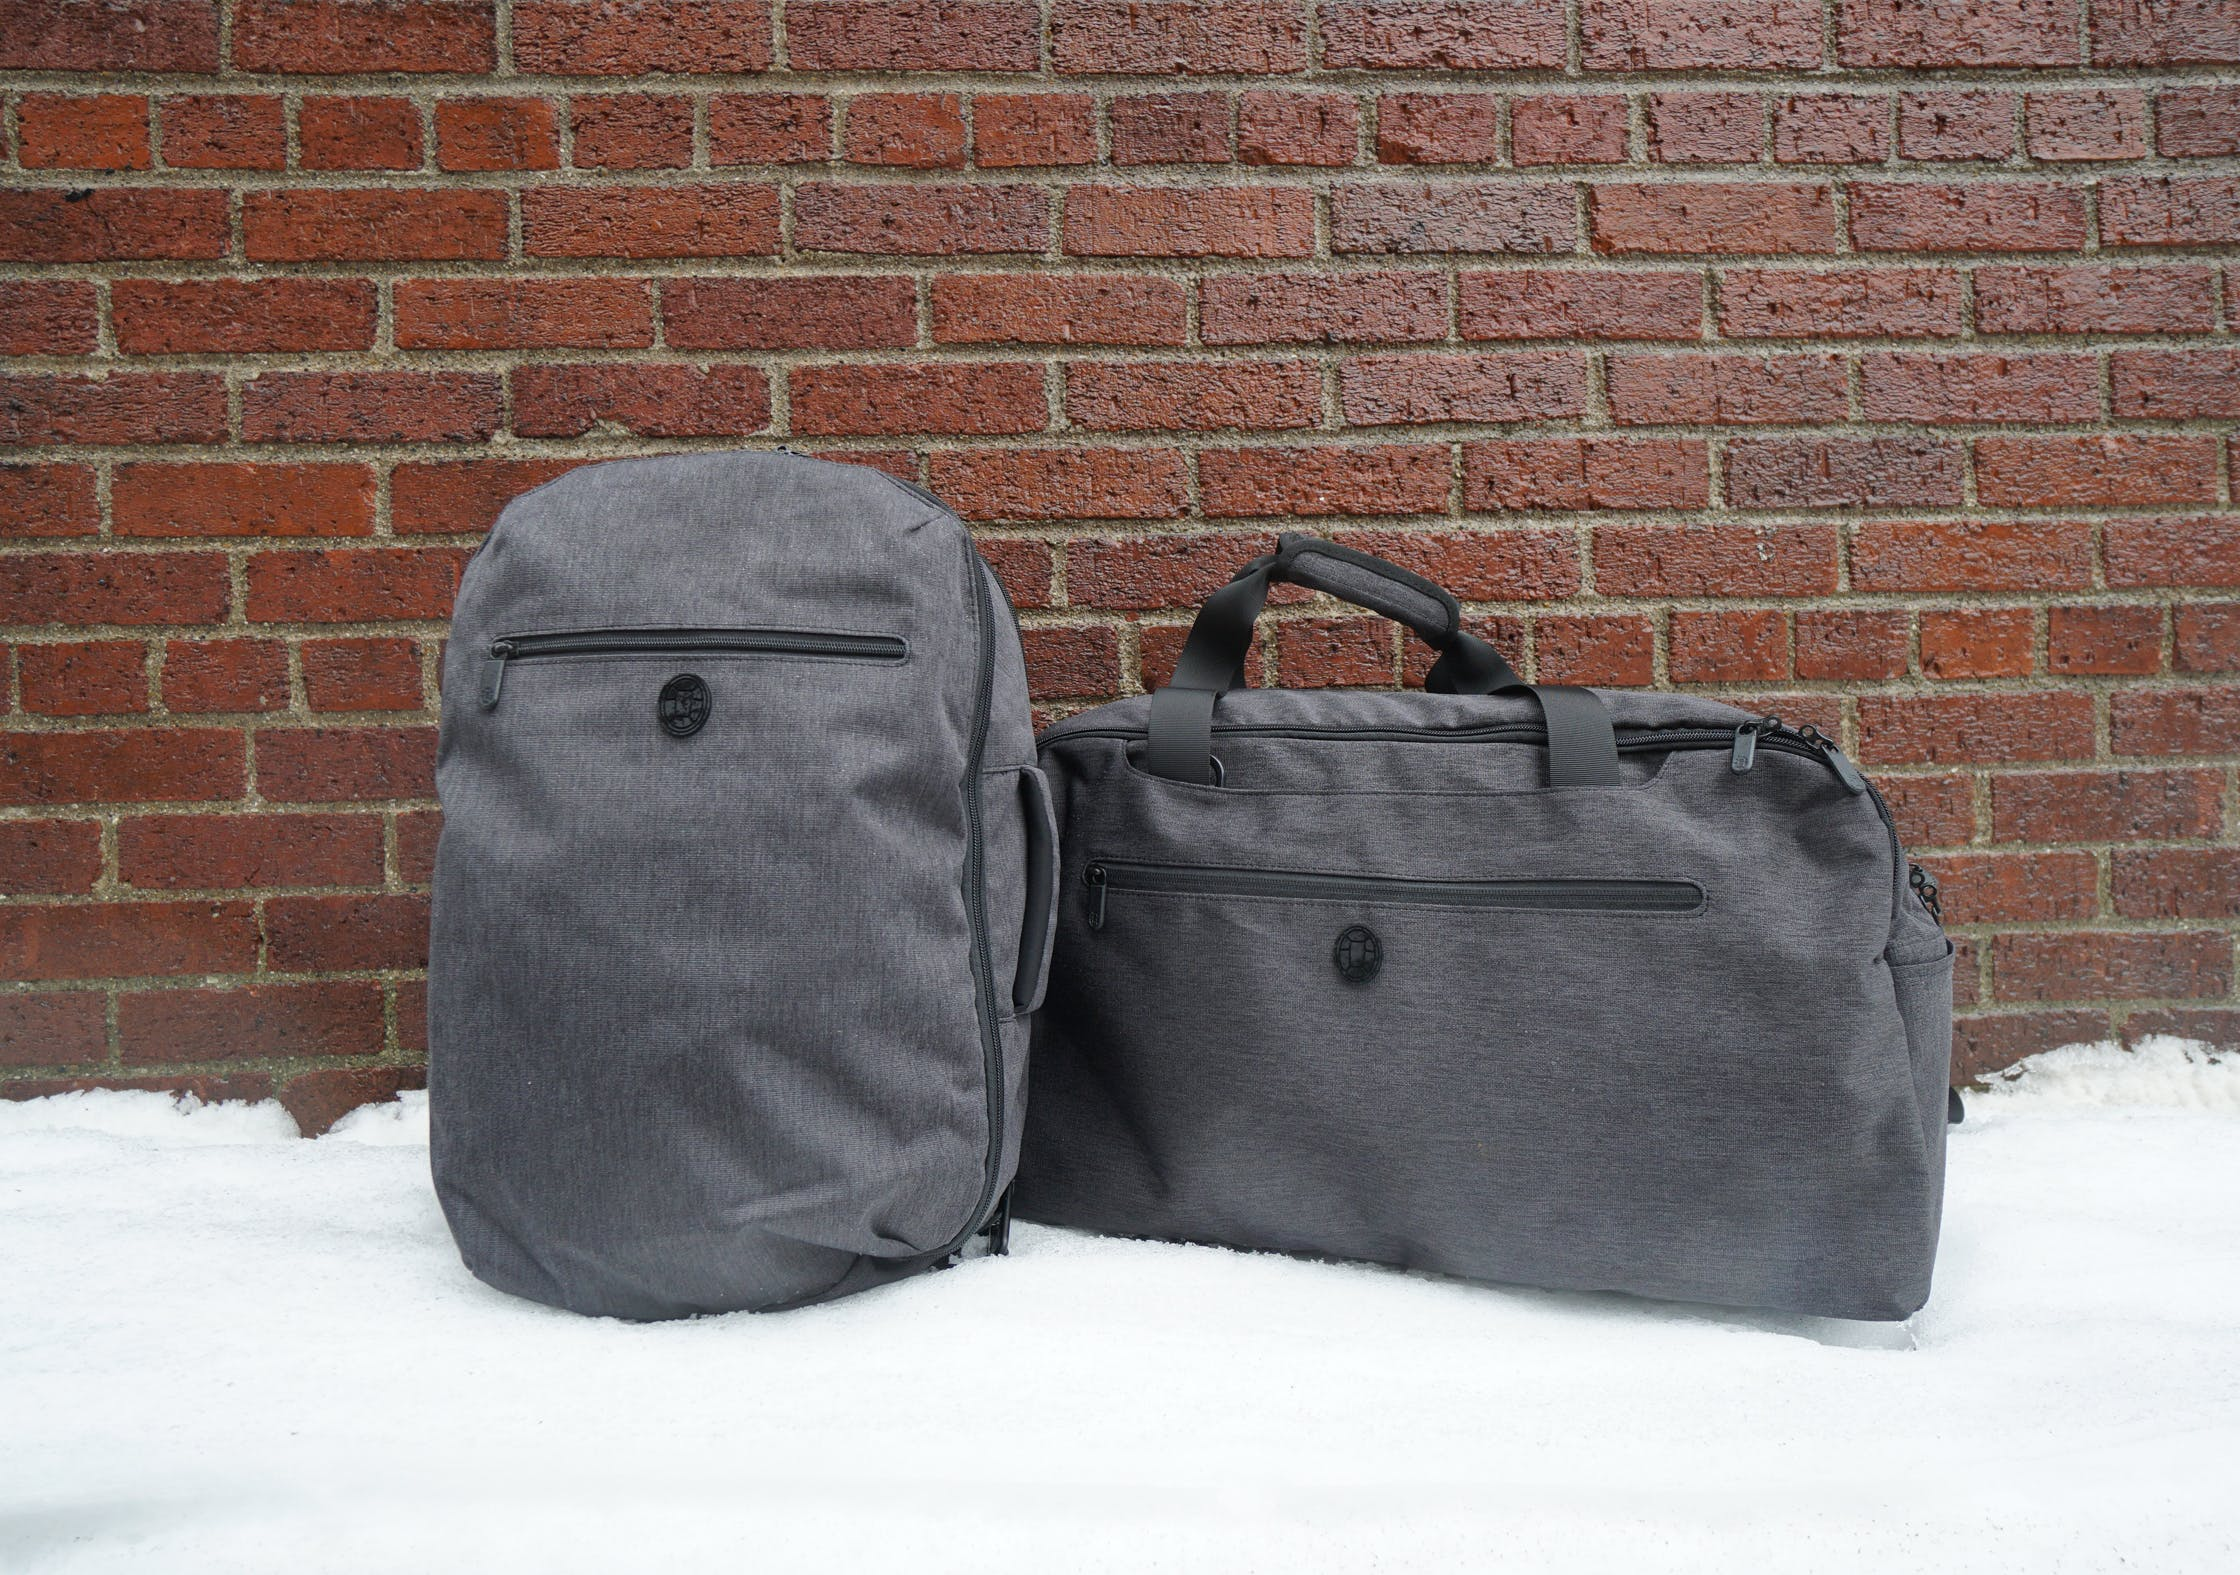 6843328c1c1d6 Tortuga Setout Duffle And Setout Laptop Backpack